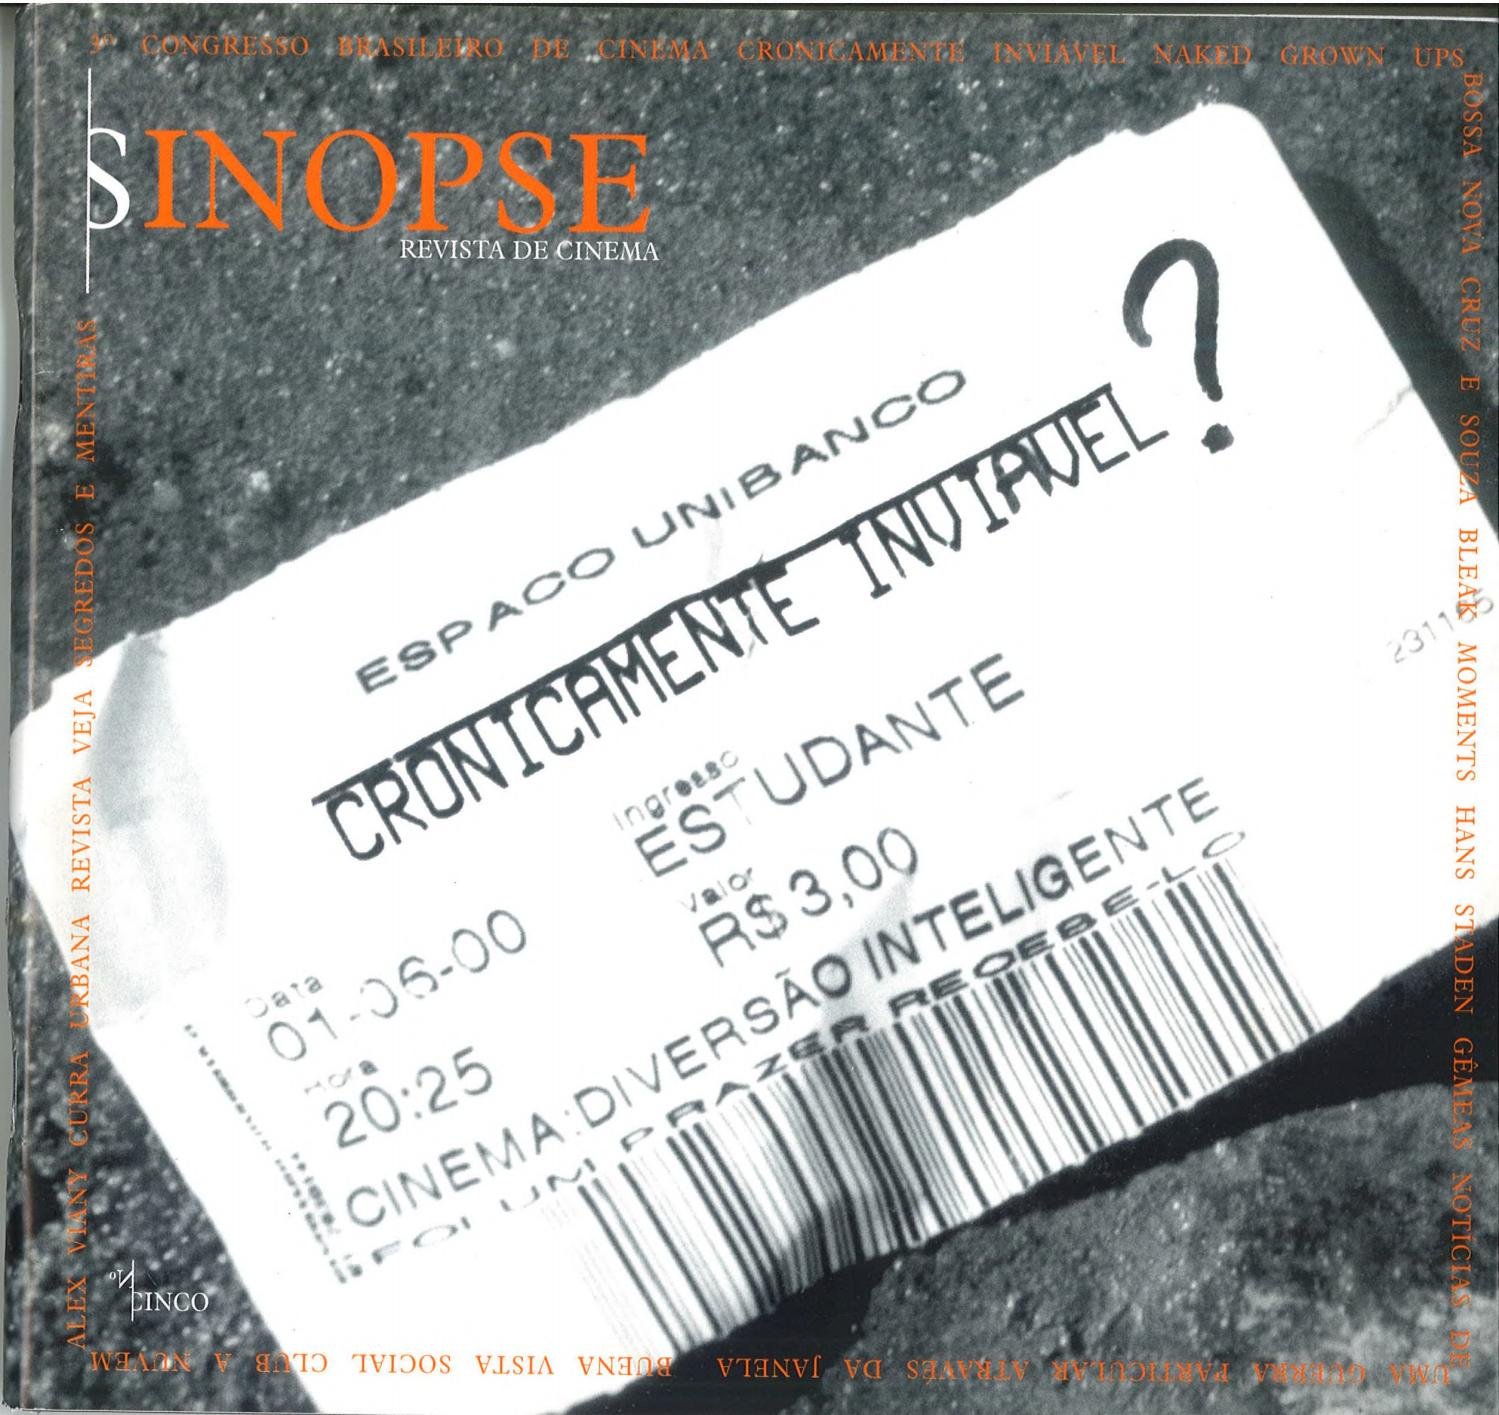 Sinopse 05 By Cinusp Paulo Emílio Issuu